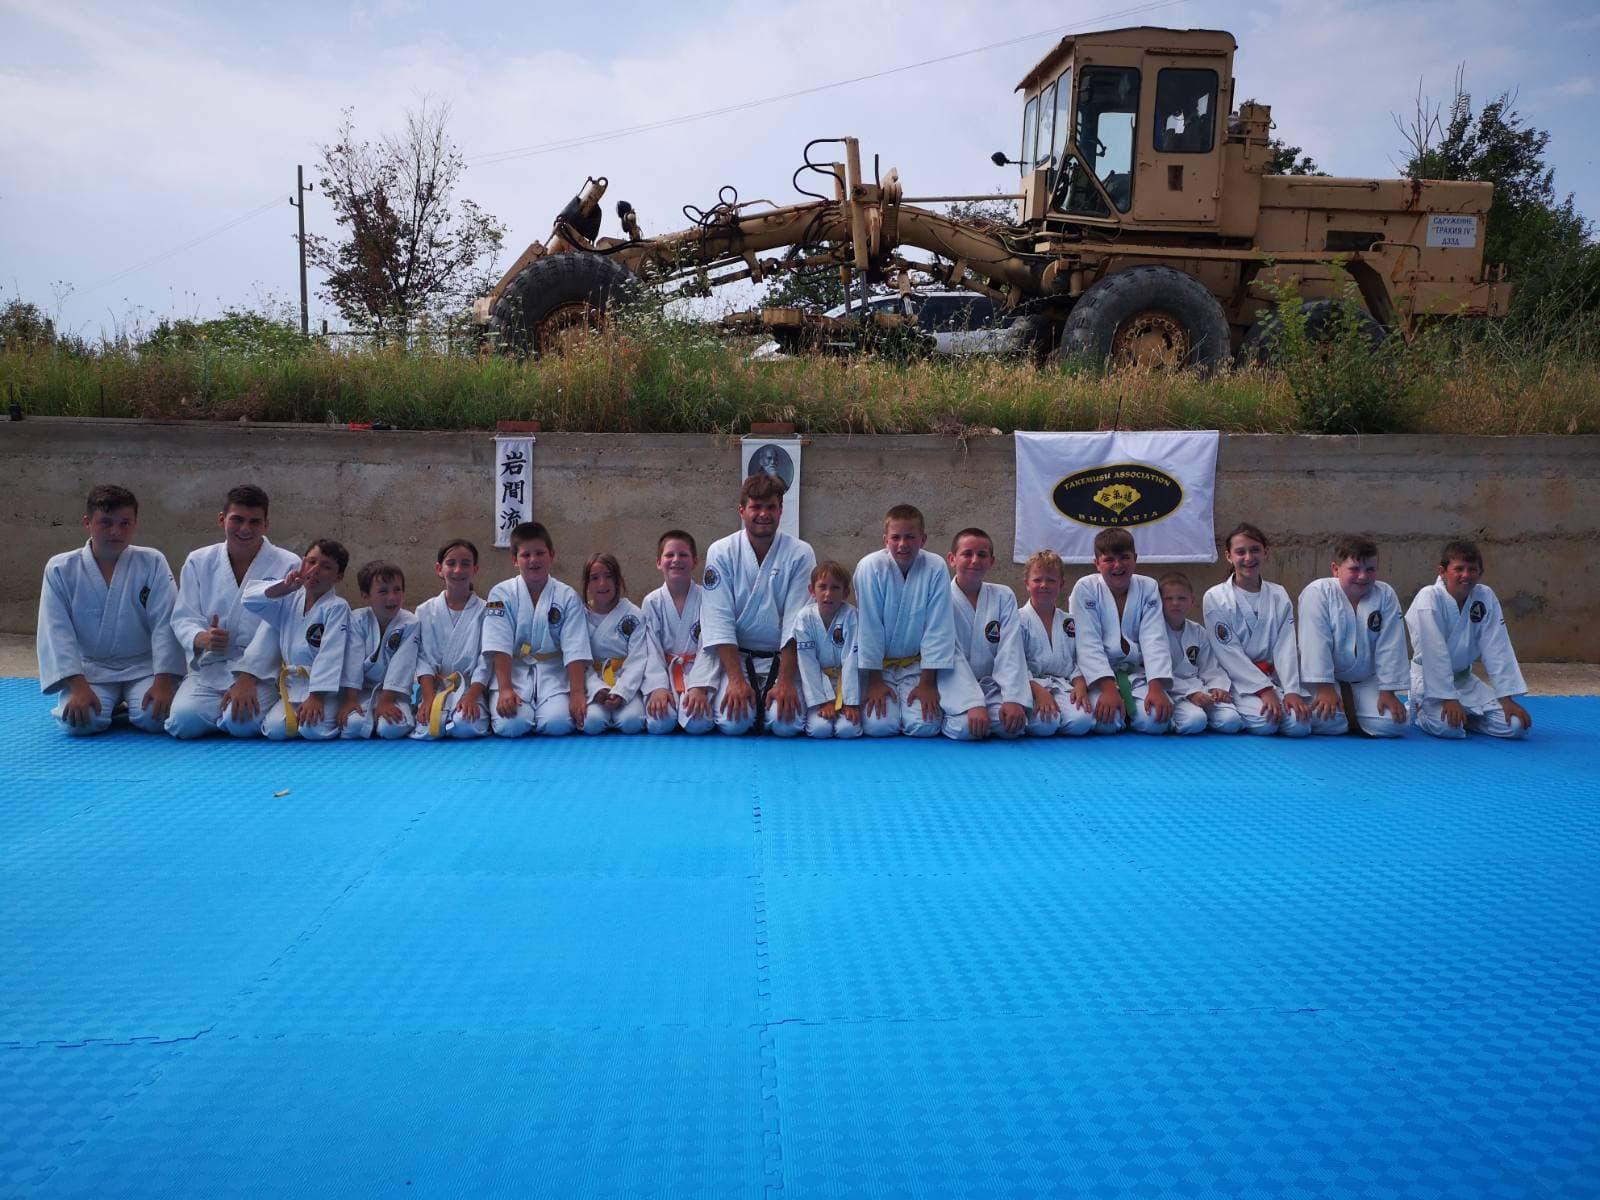 Летен лагер учи деца на бойни изкуства, дисциплина и ценности